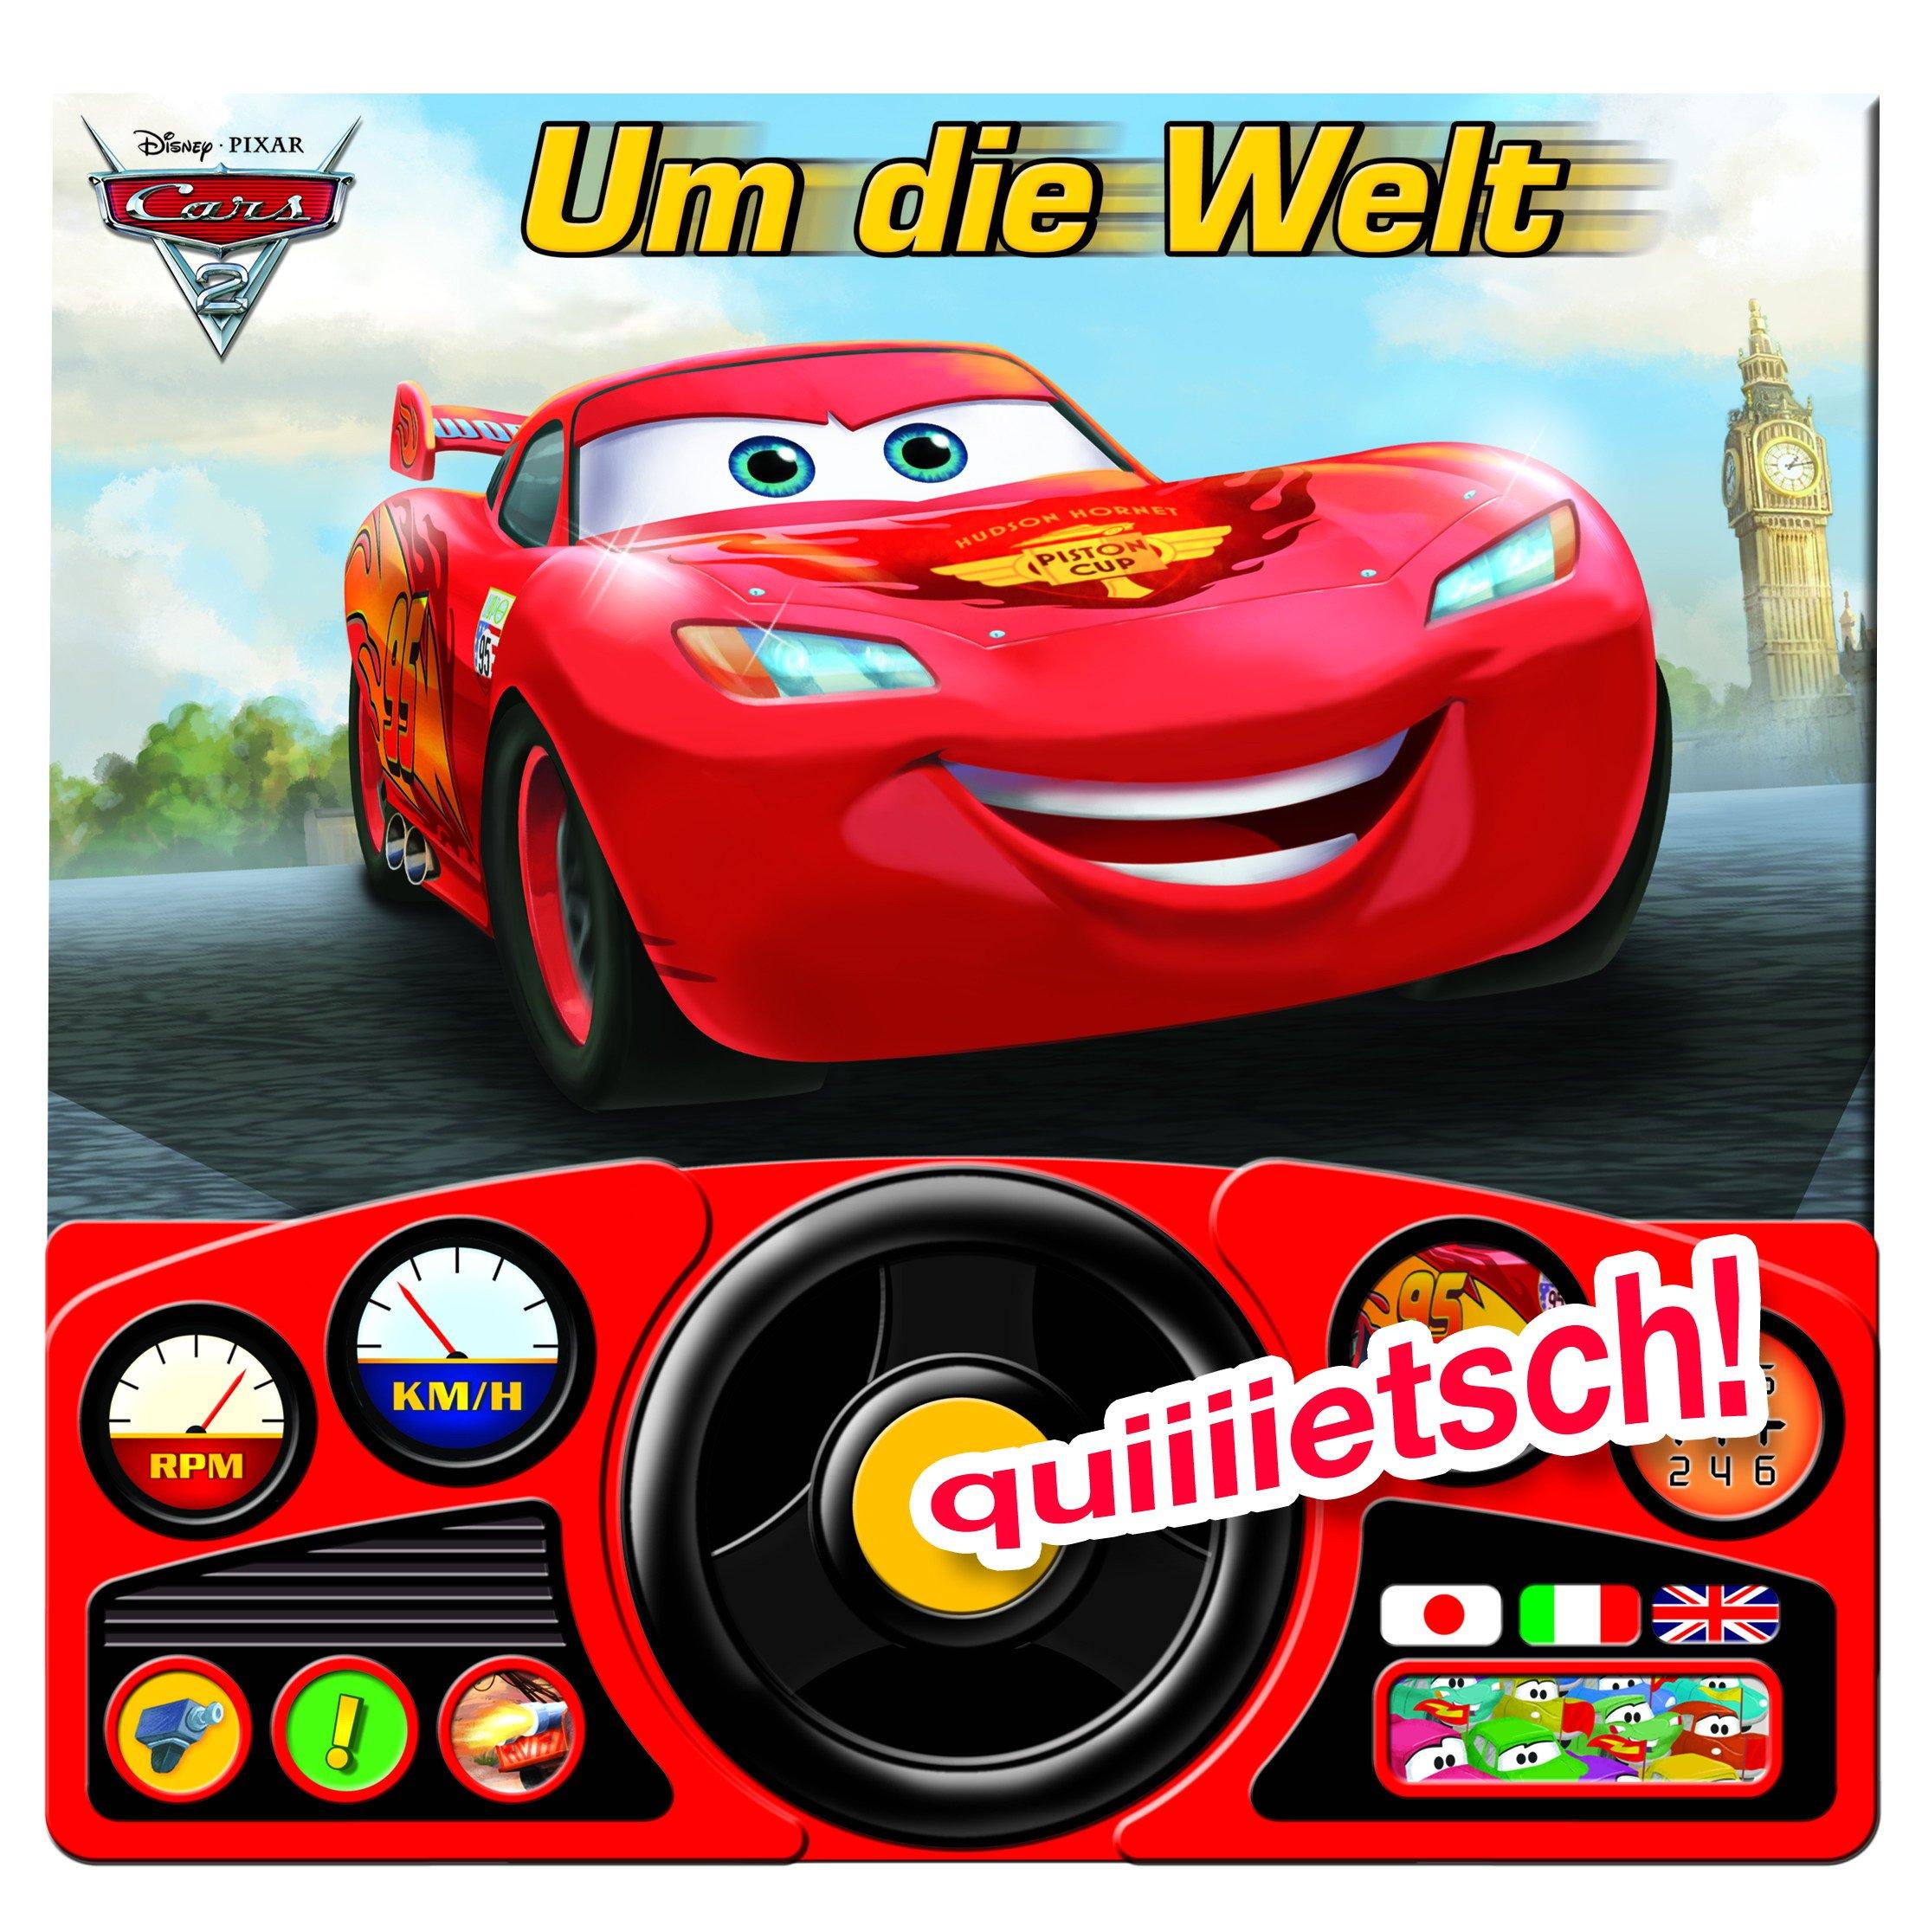 Um die Welt - Cars 2